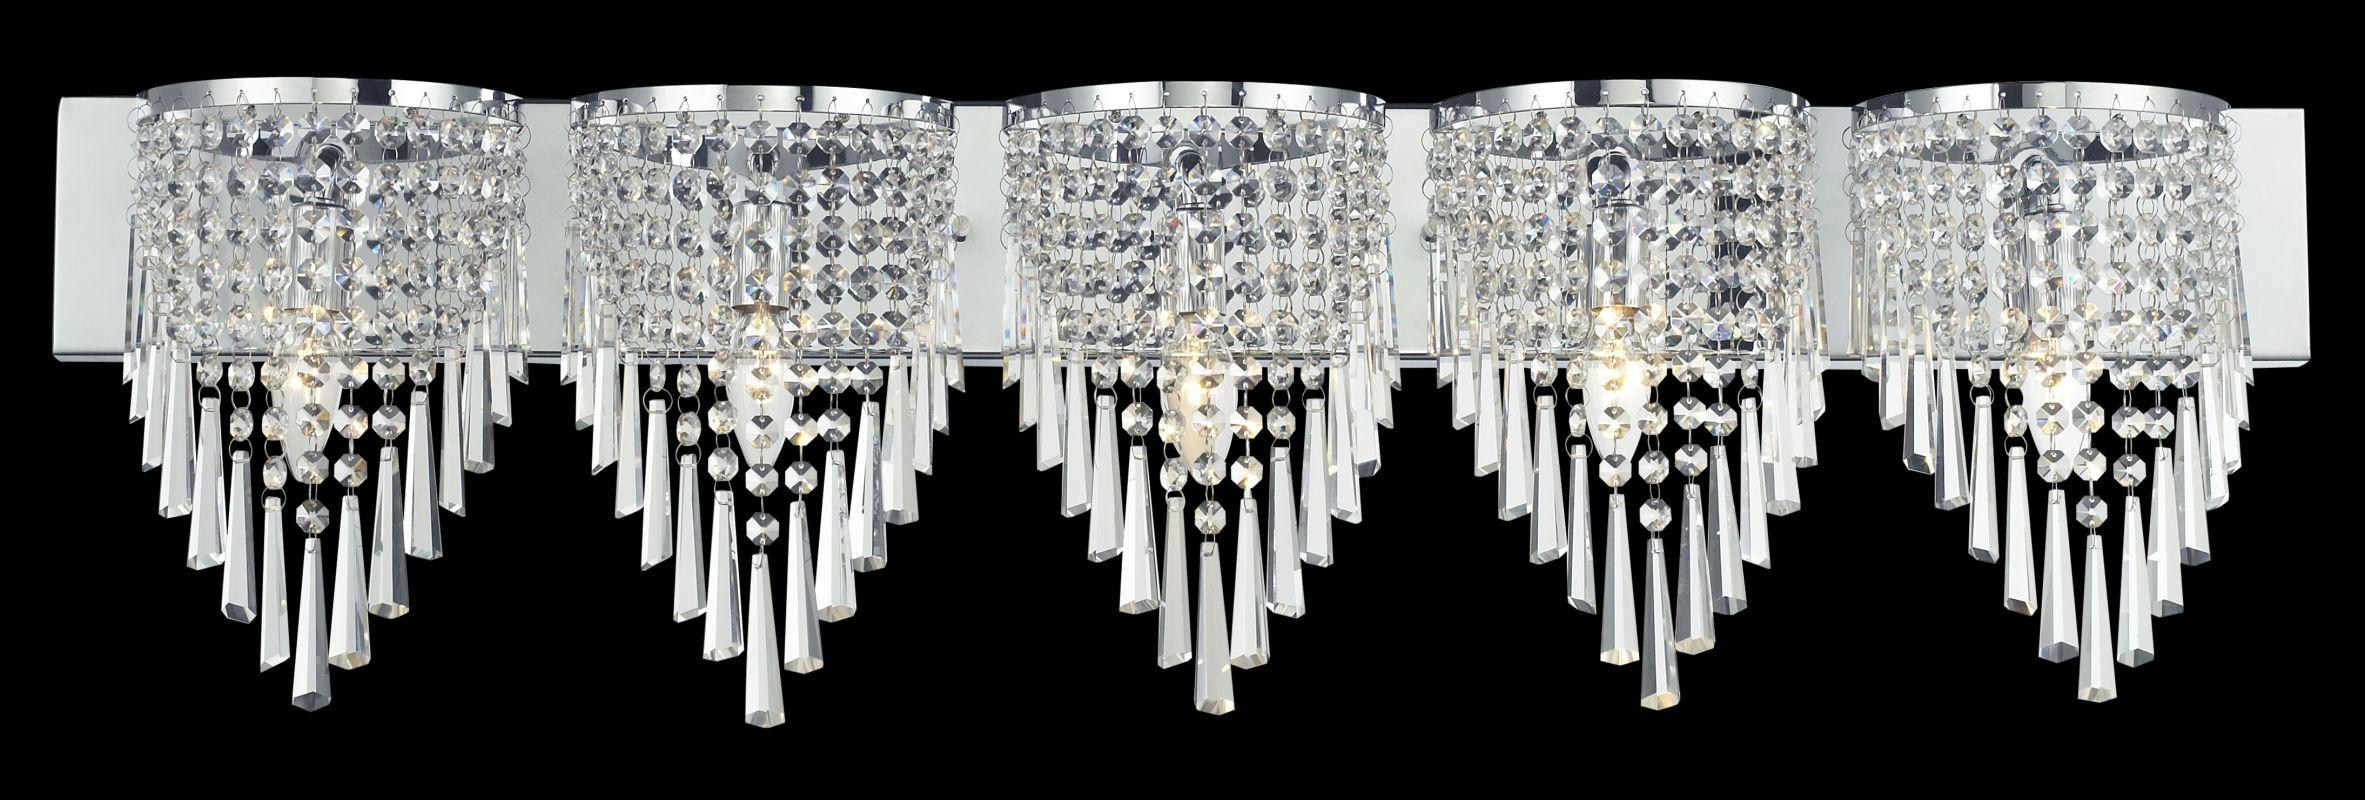 Z-Lite 868-5V Tango 5 Light Bathroom Vanity Light with Crystal Shade Sale $540.00 ITEM: bci2518700 ID#:868CH-5V UPC: 685659017922 :